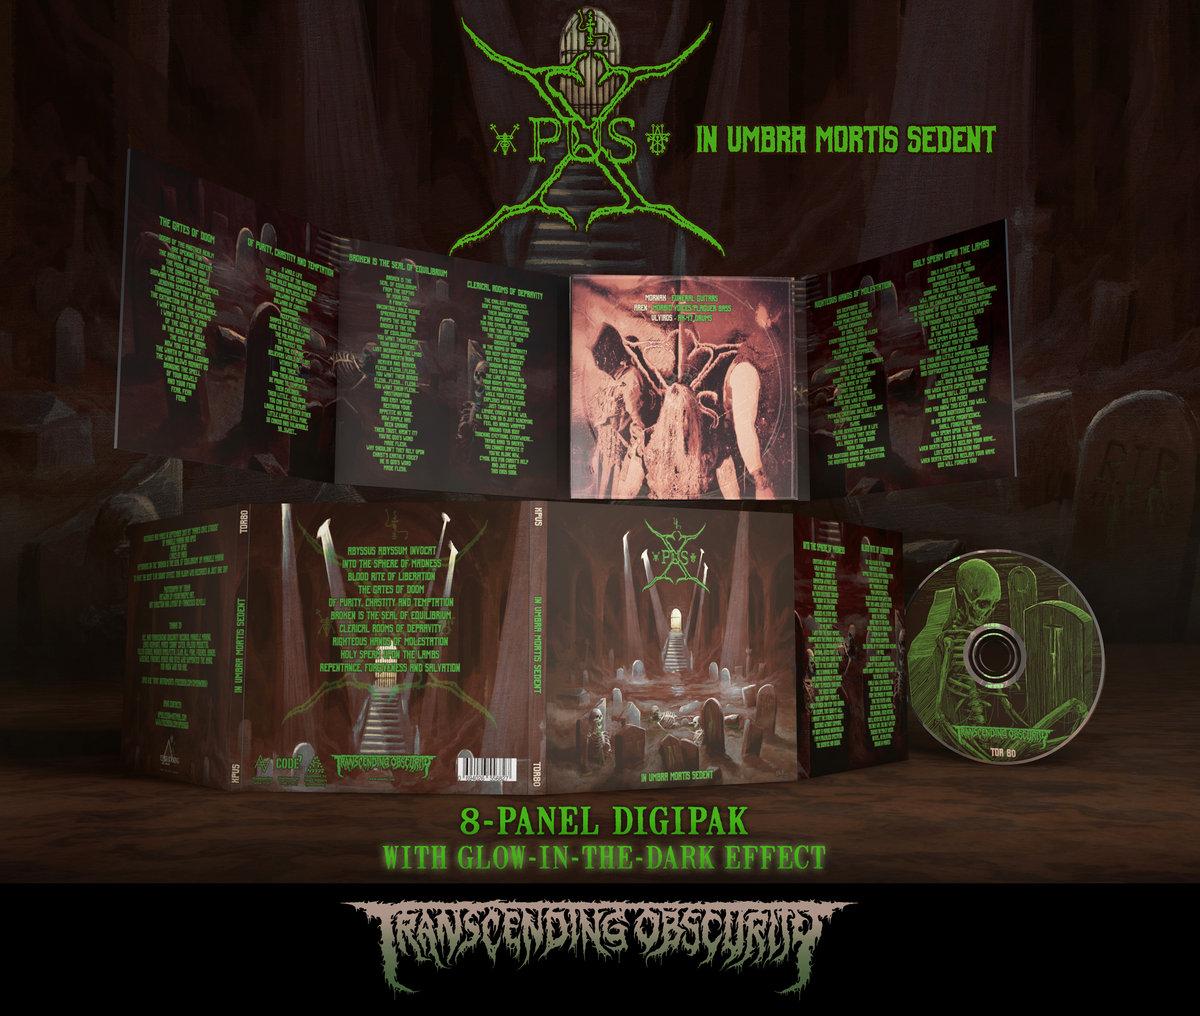 XPUS -  In Umbra Mortis Sedent (Death Metal) Glow-in-the-dark effect 8-Panel Digipak CD